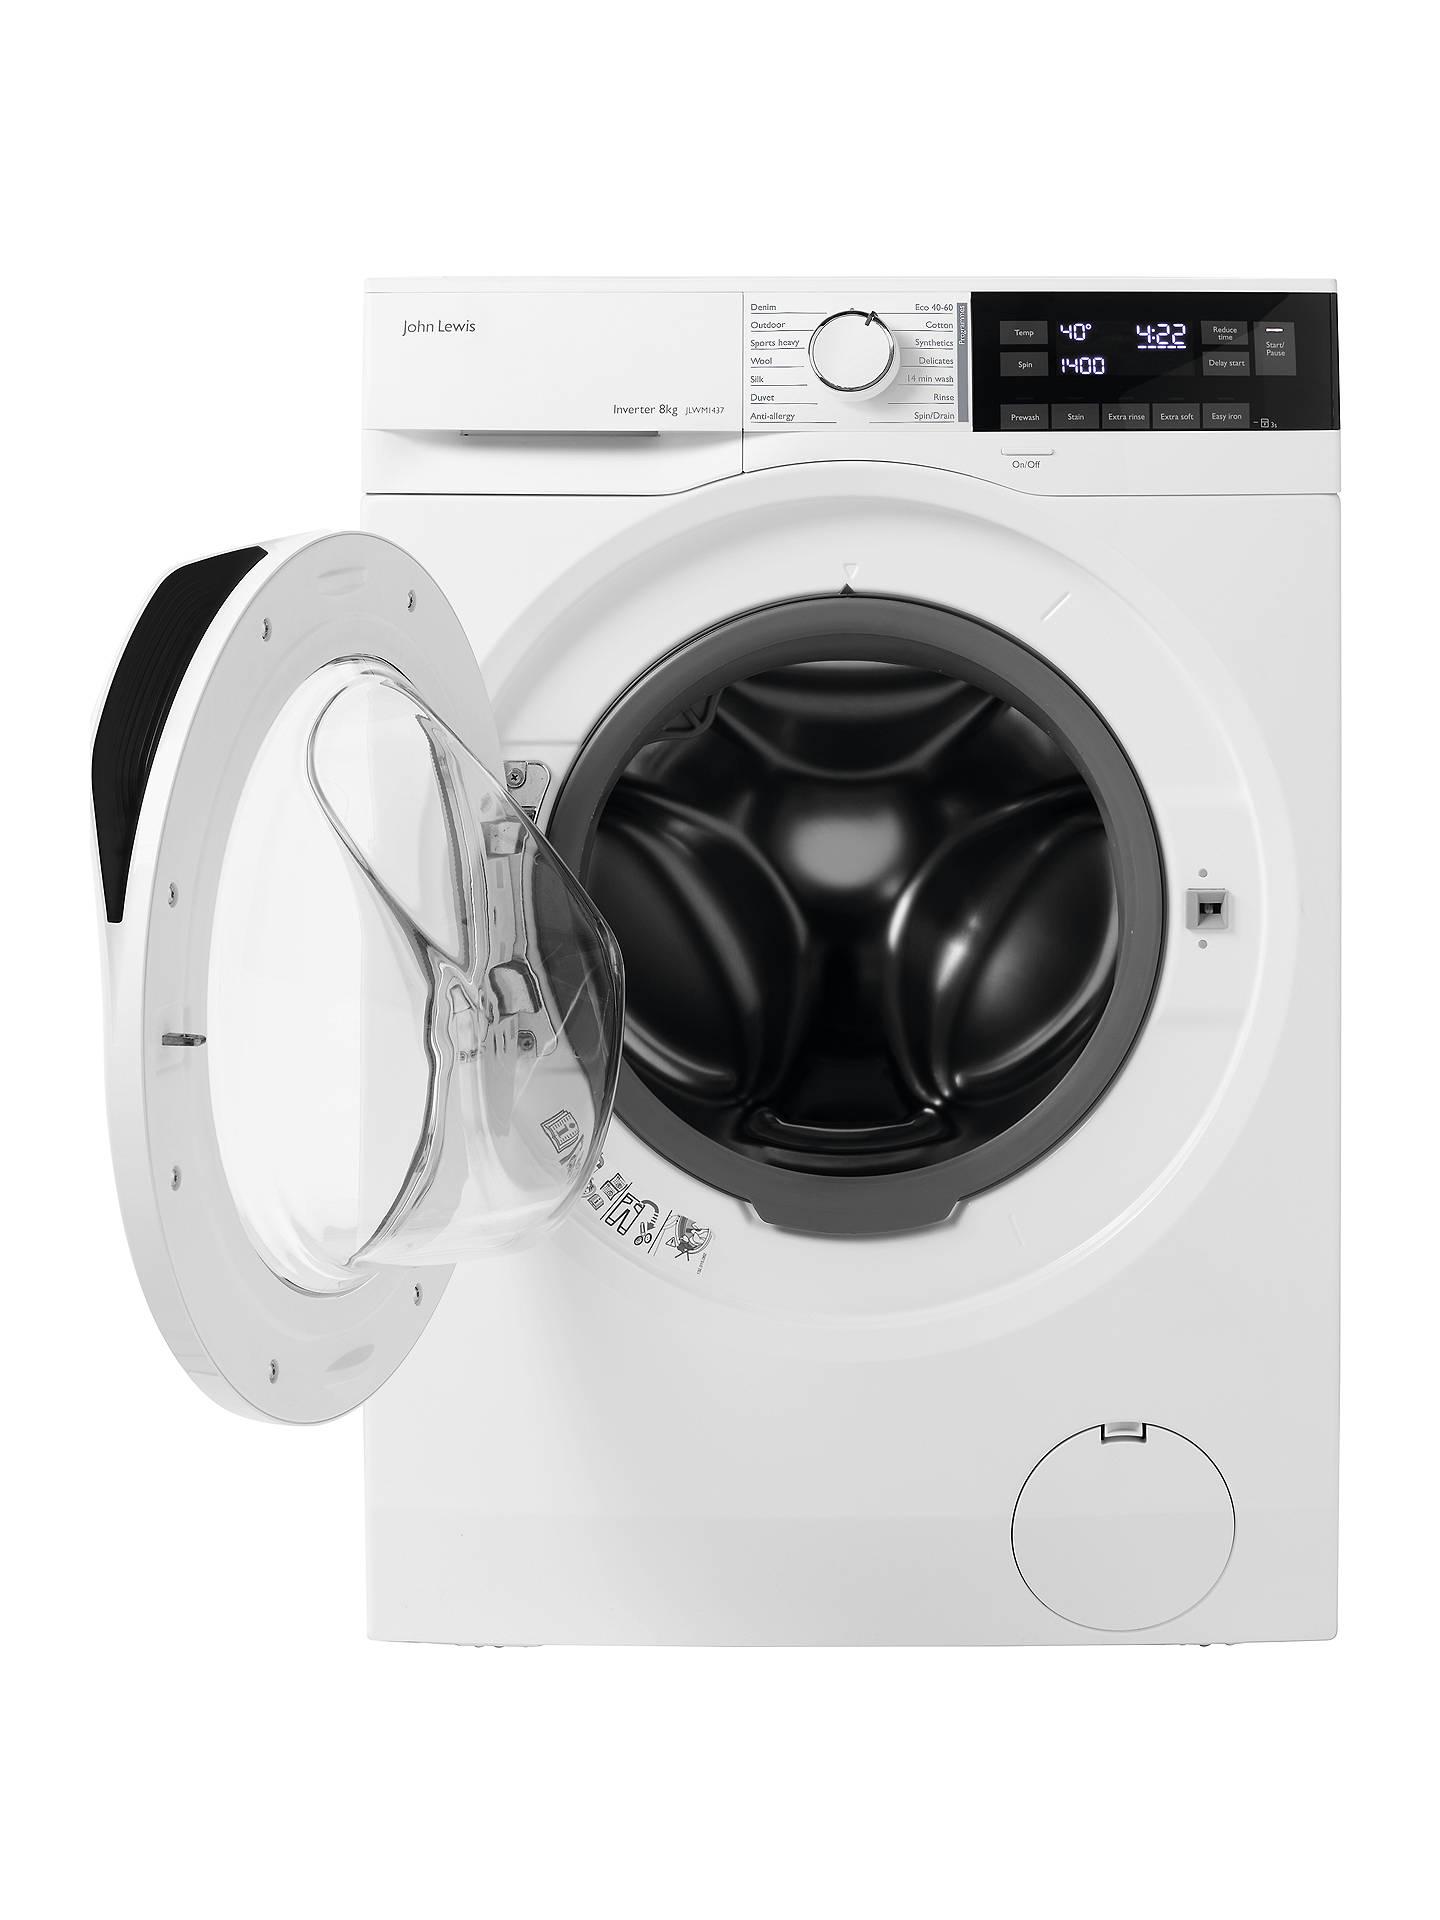 Verwonderlijk John Lewis & Partners JLWM1437 Freestanding Washing Machine, 8kg RM-49